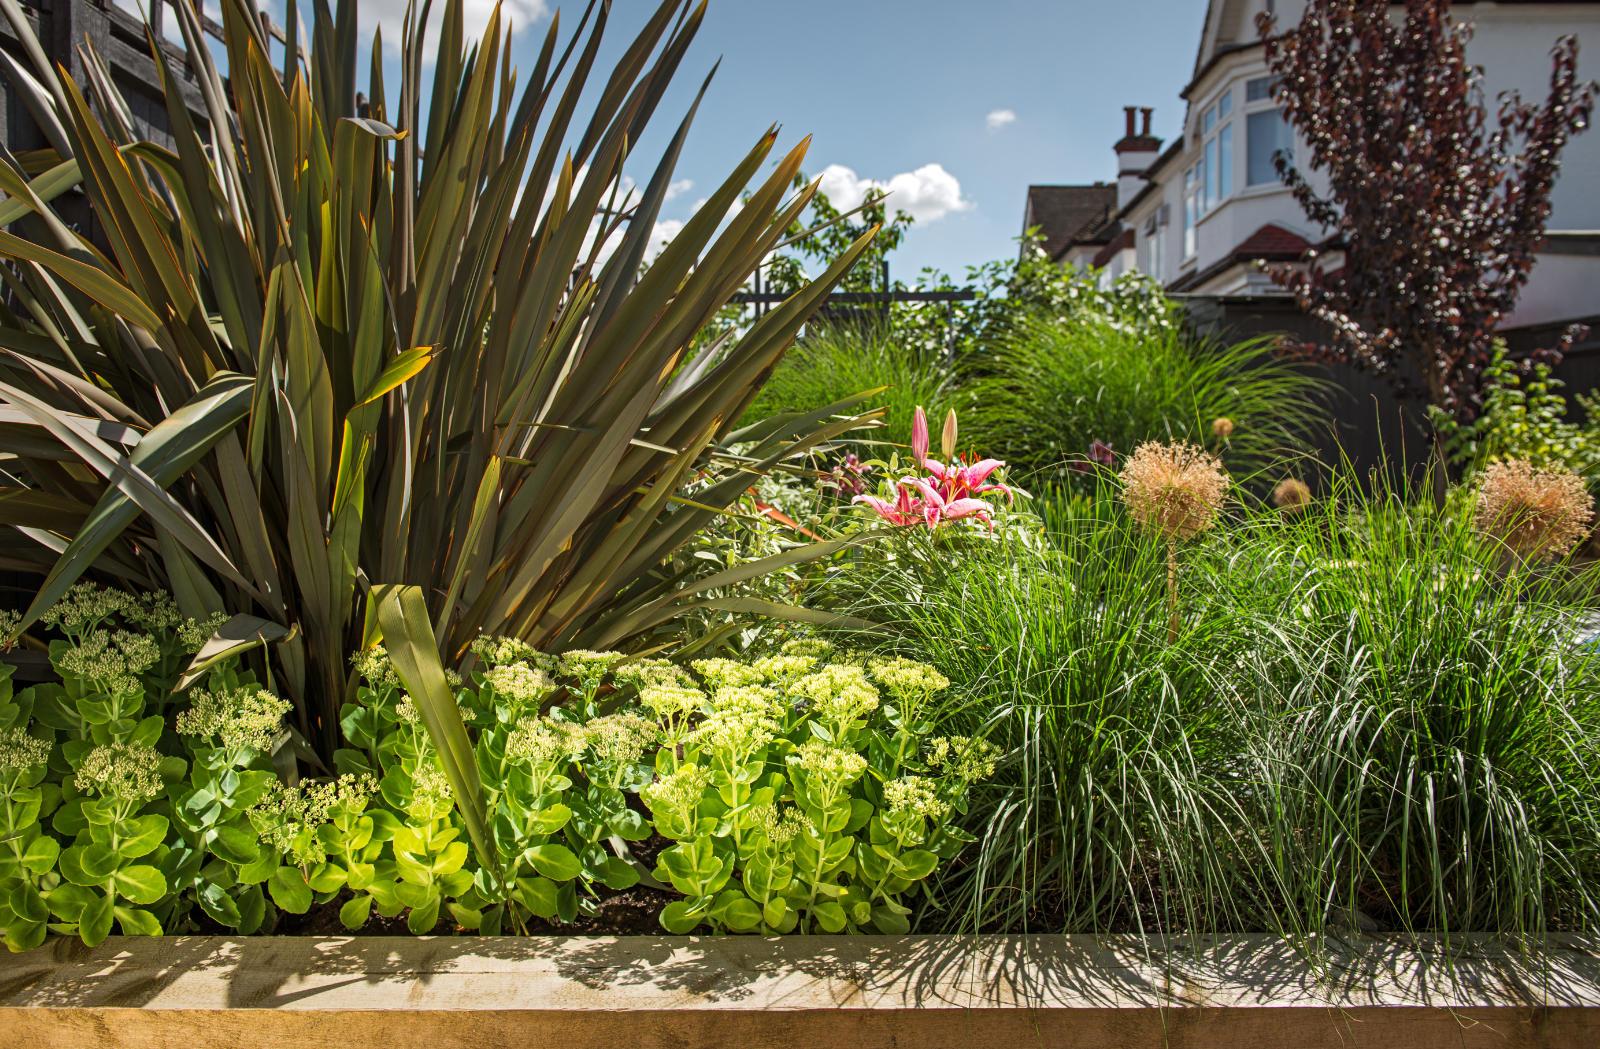 Beyond Bloom Garden Maintenance - Sedum - Streatham Hill - London